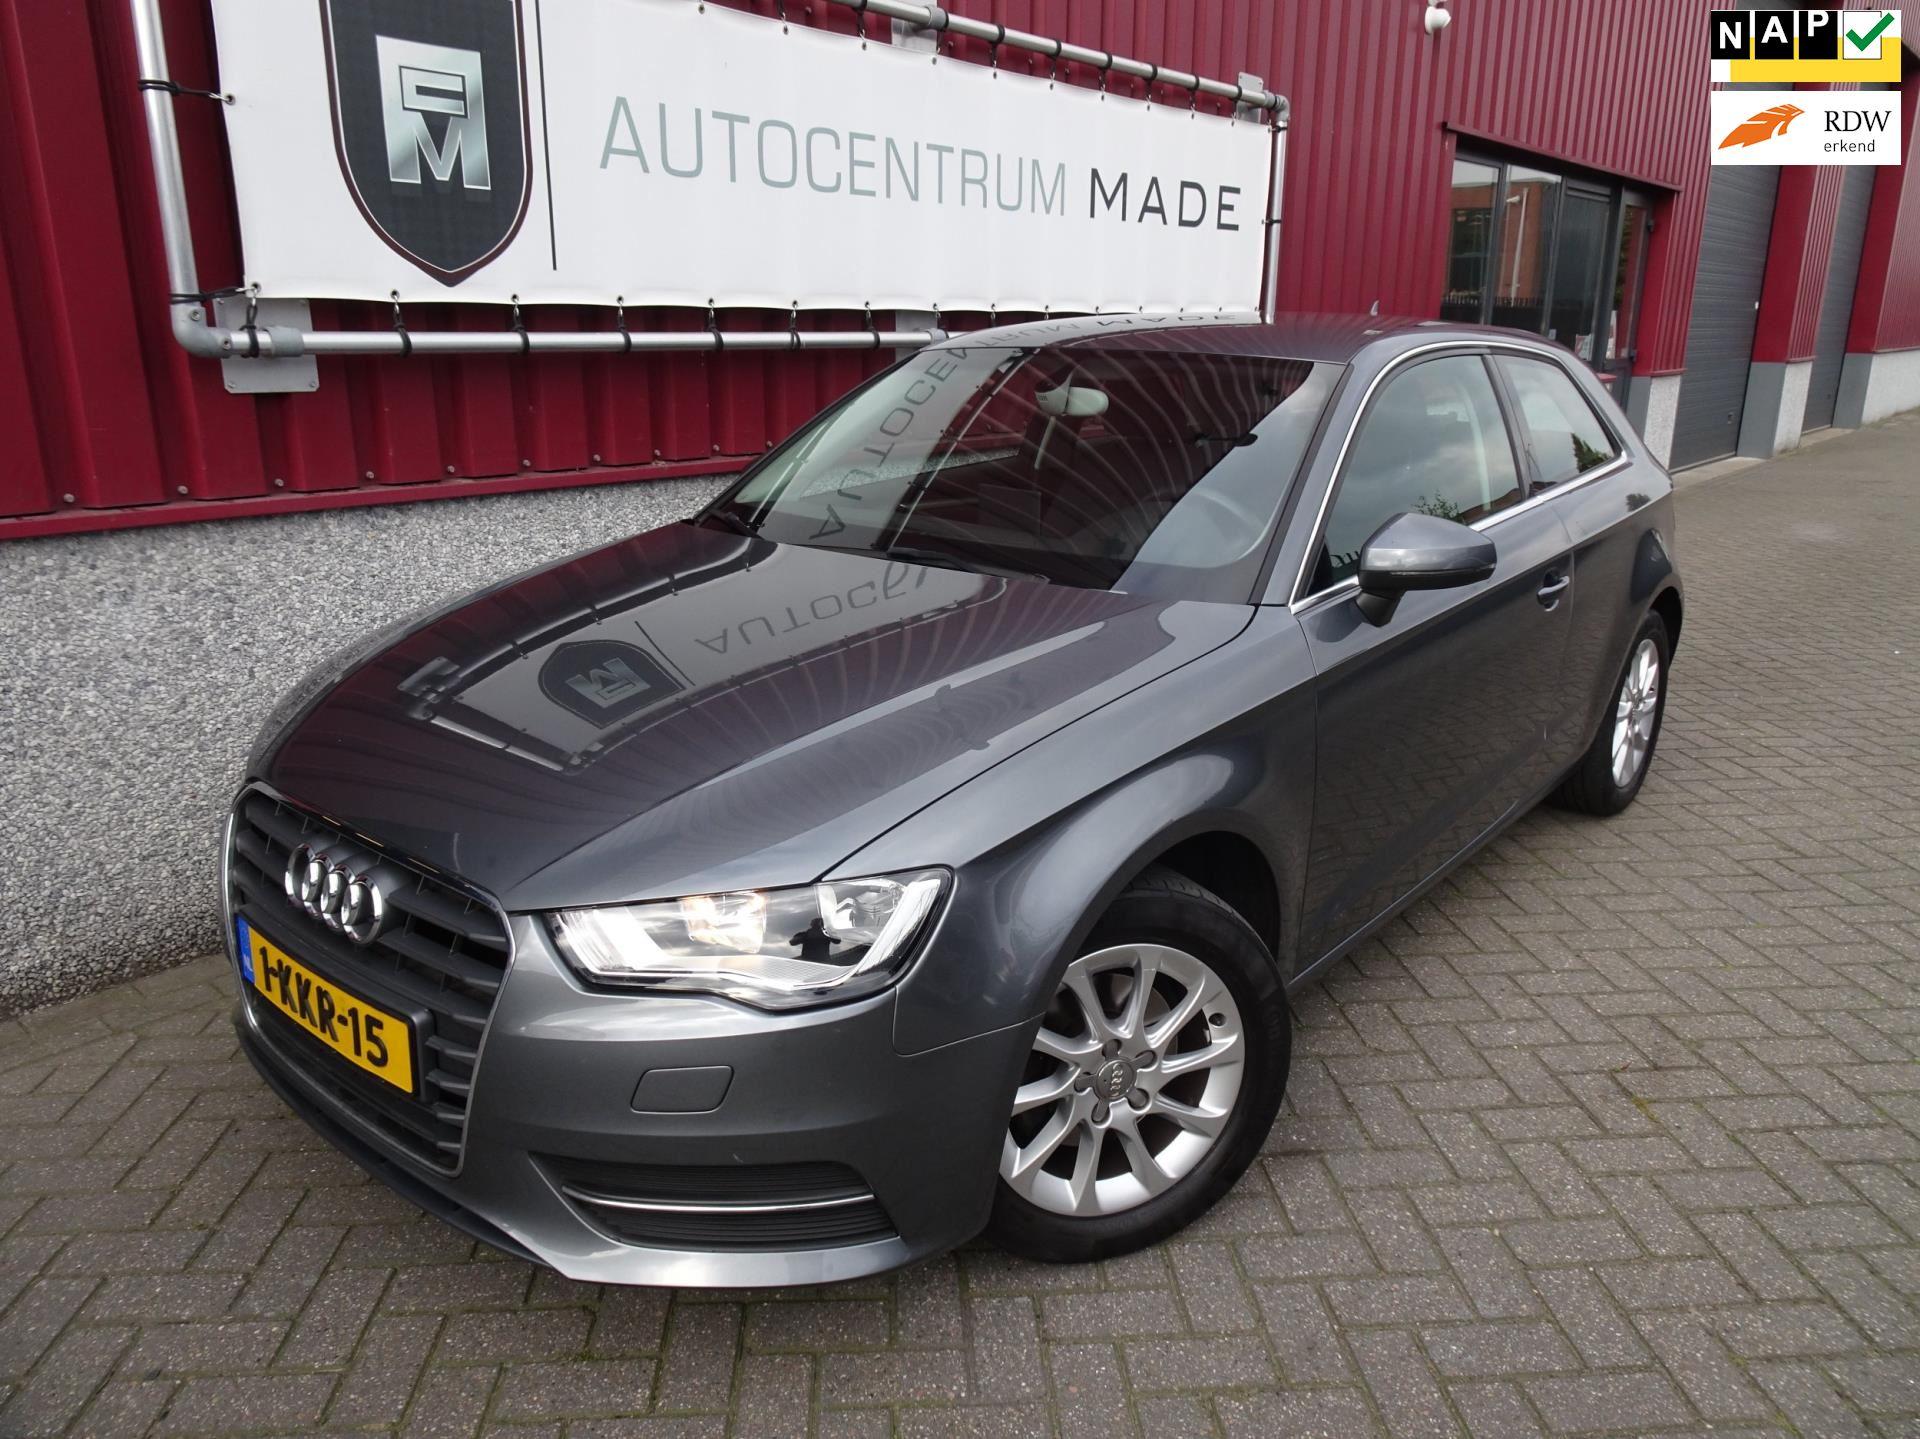 Audi A3 occasion - Auto Centrum Made